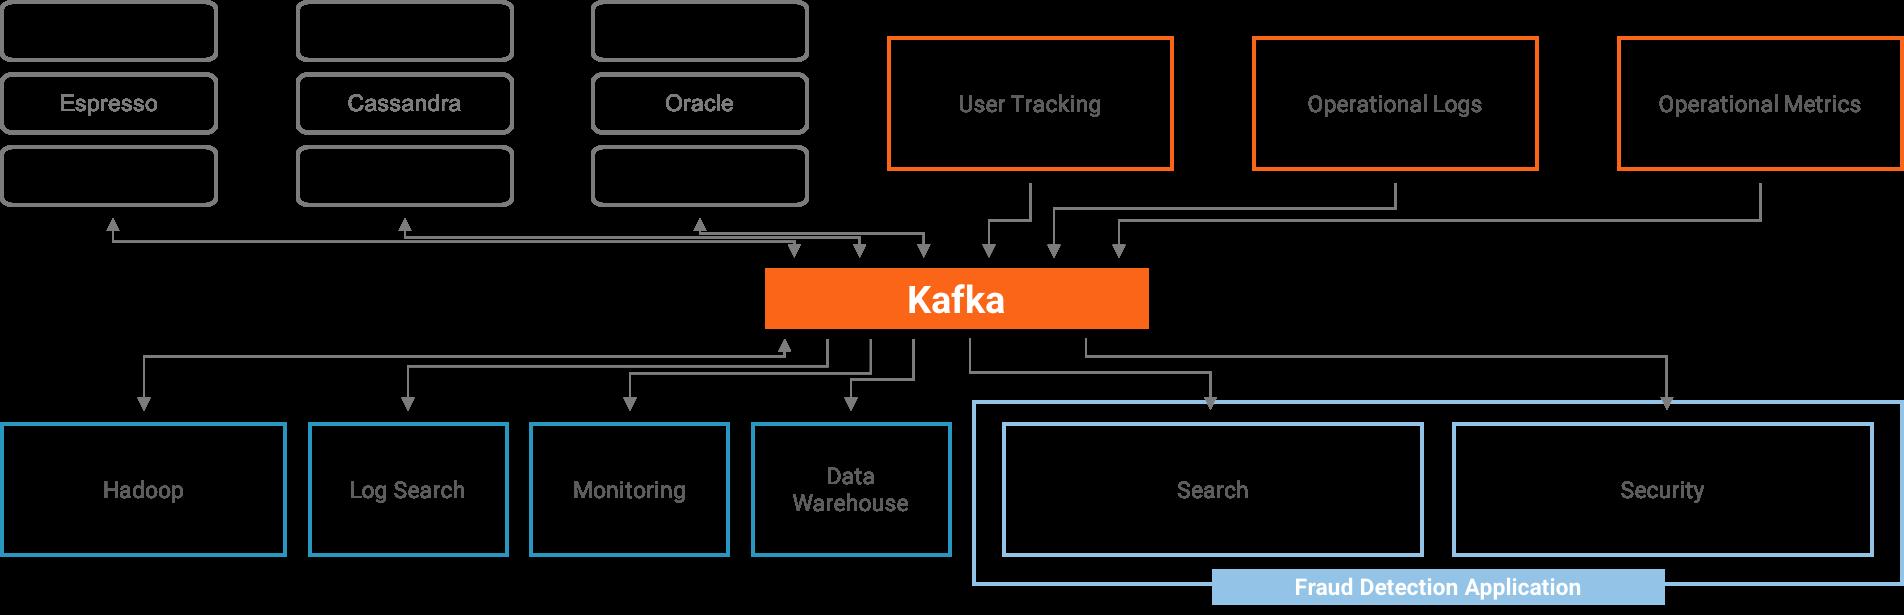 moving-to-aws-cloud-with-kafka-img-3